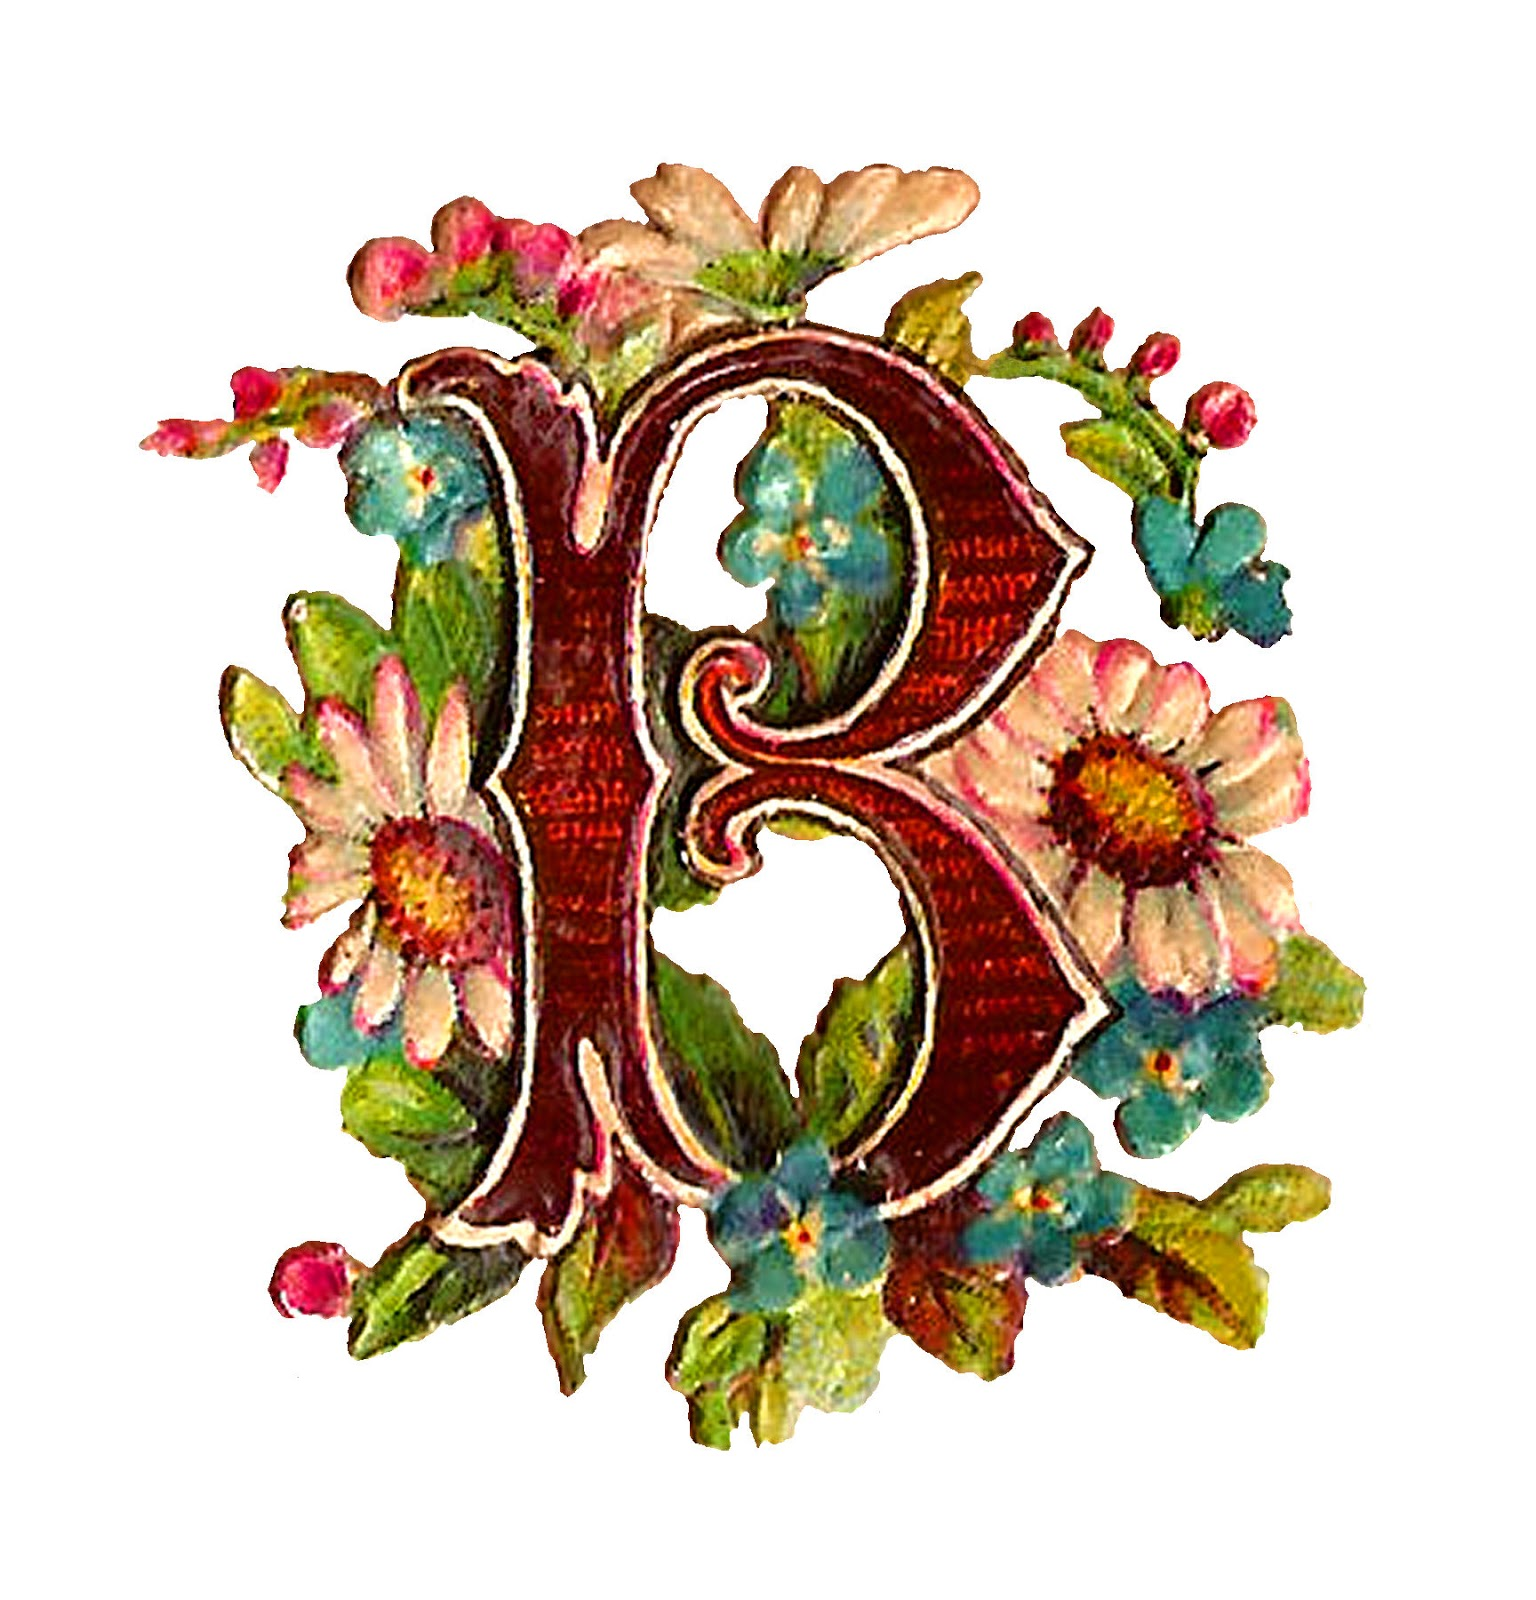 drop cap letter image crafting clipart floral design digital download [ 1536 x 1600 Pixel ]